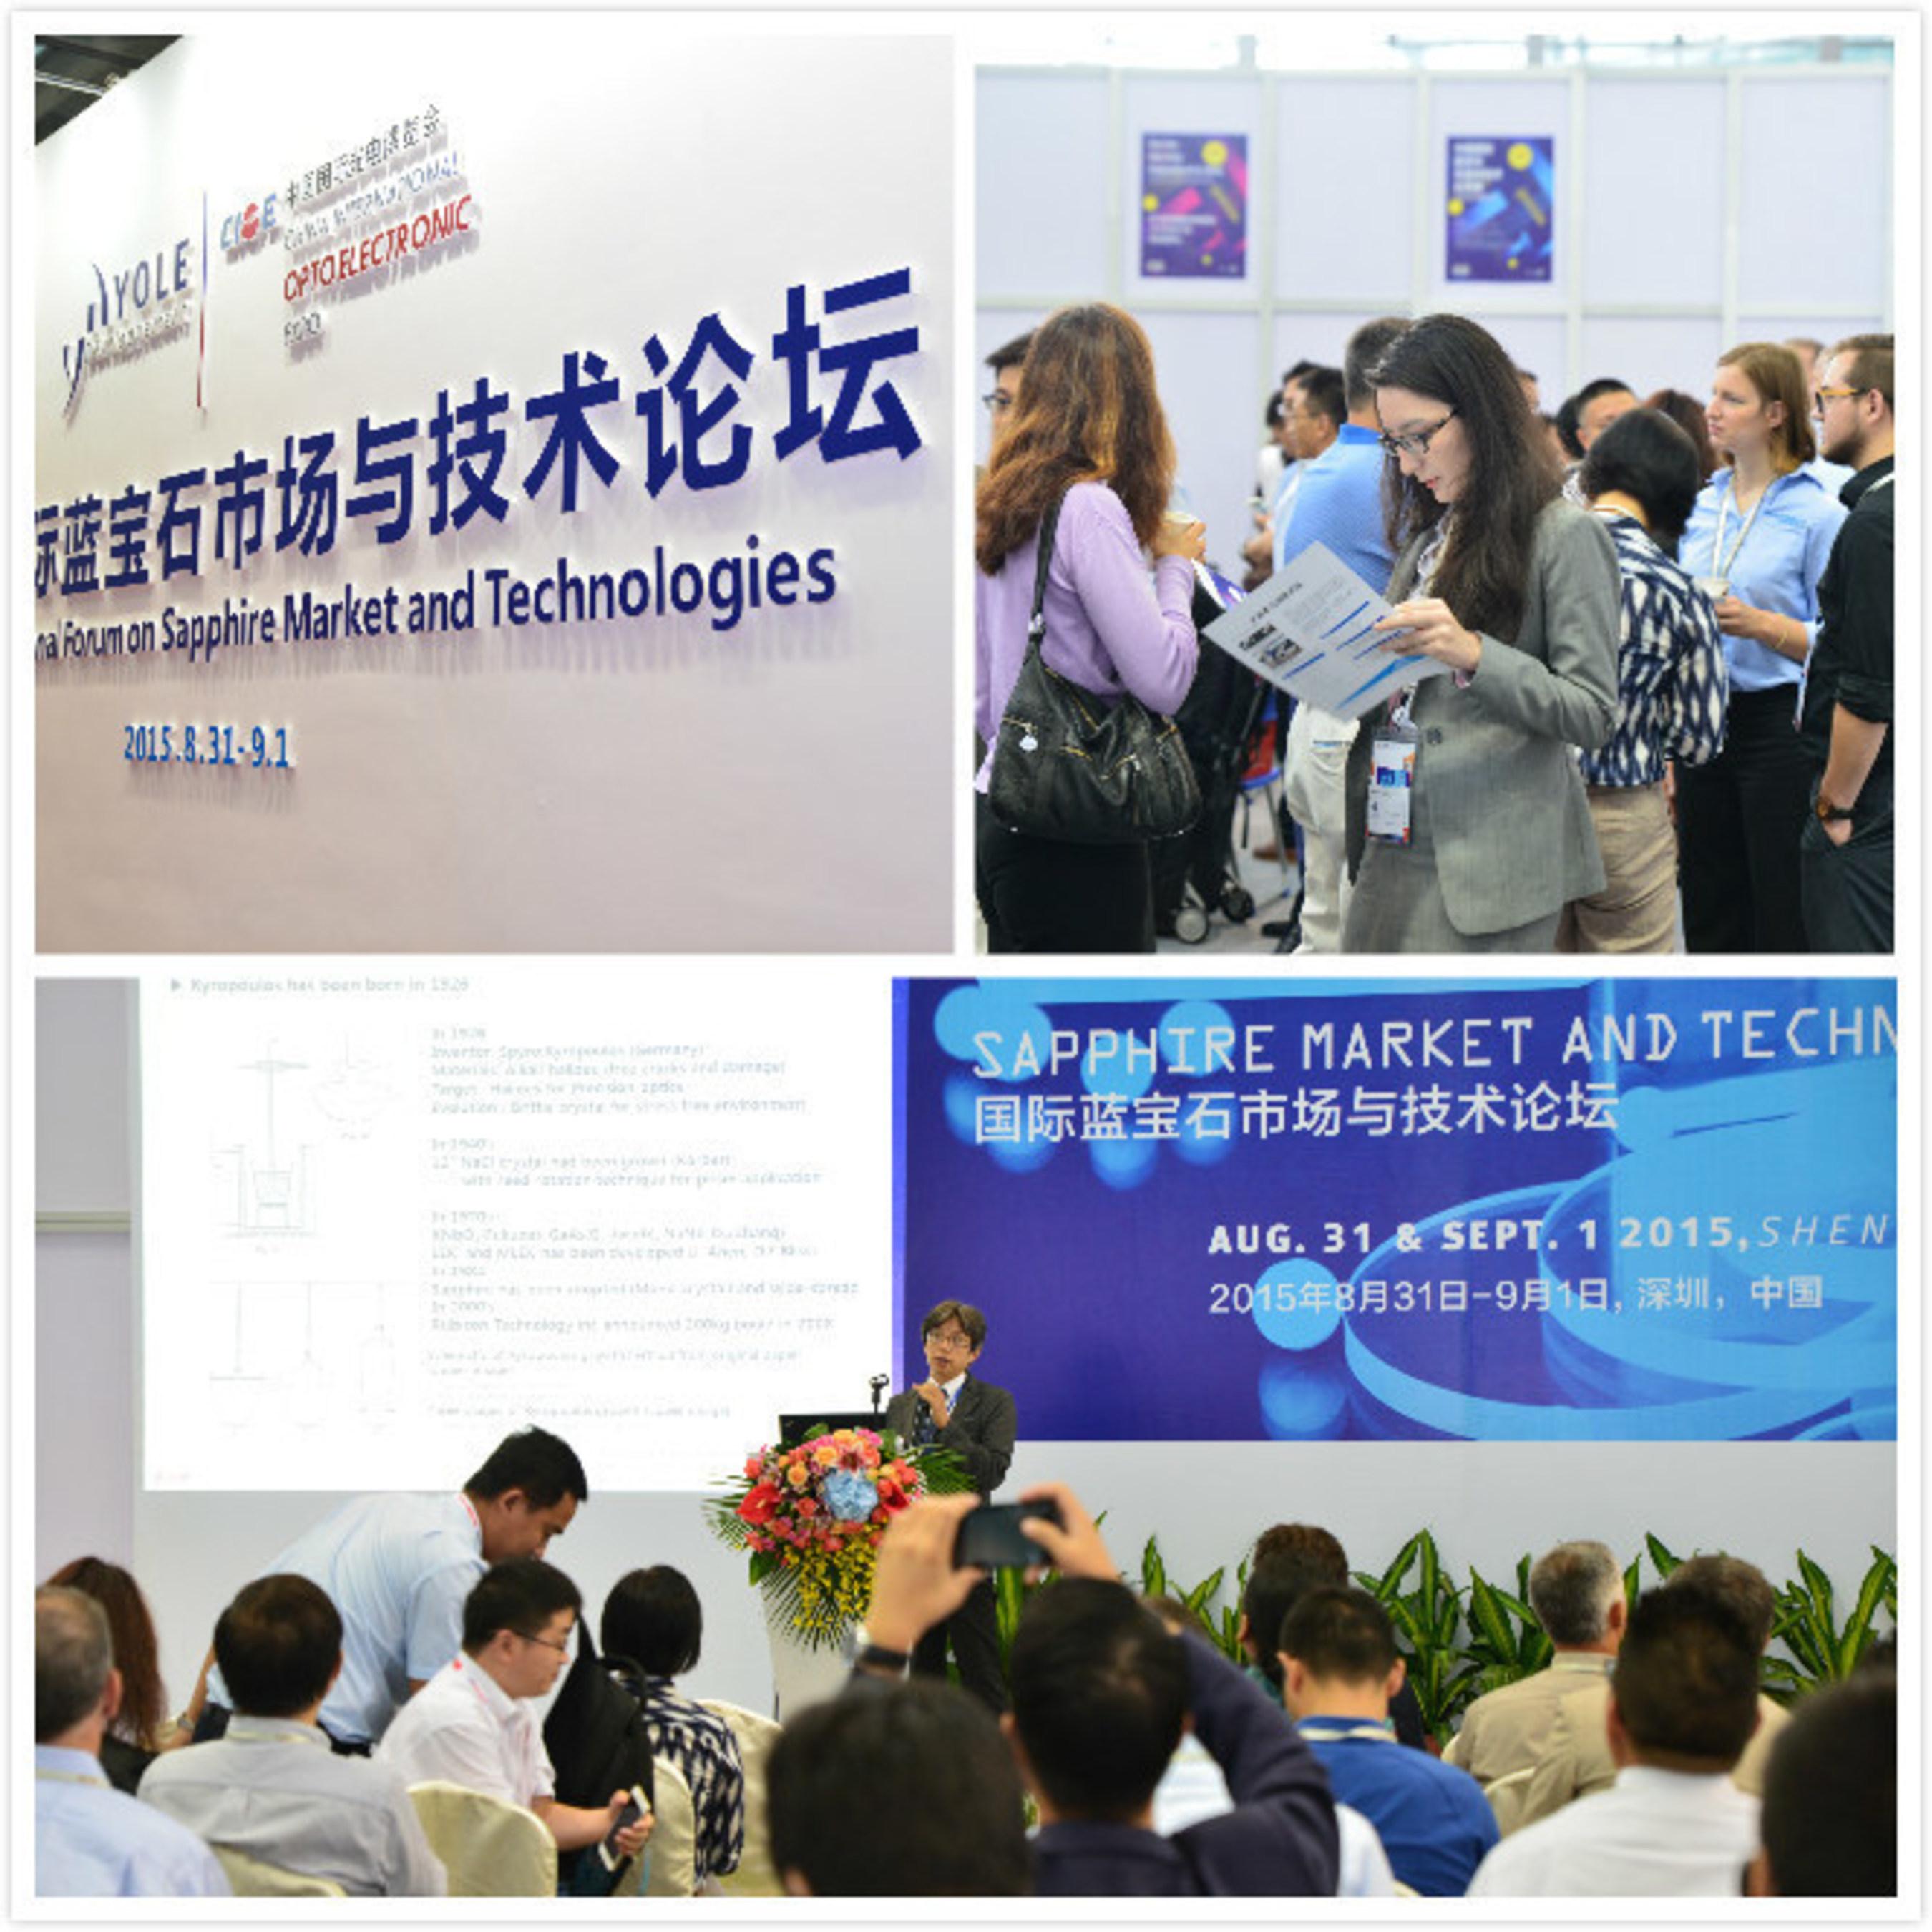 International Forum on Sapphire Market & Technologies